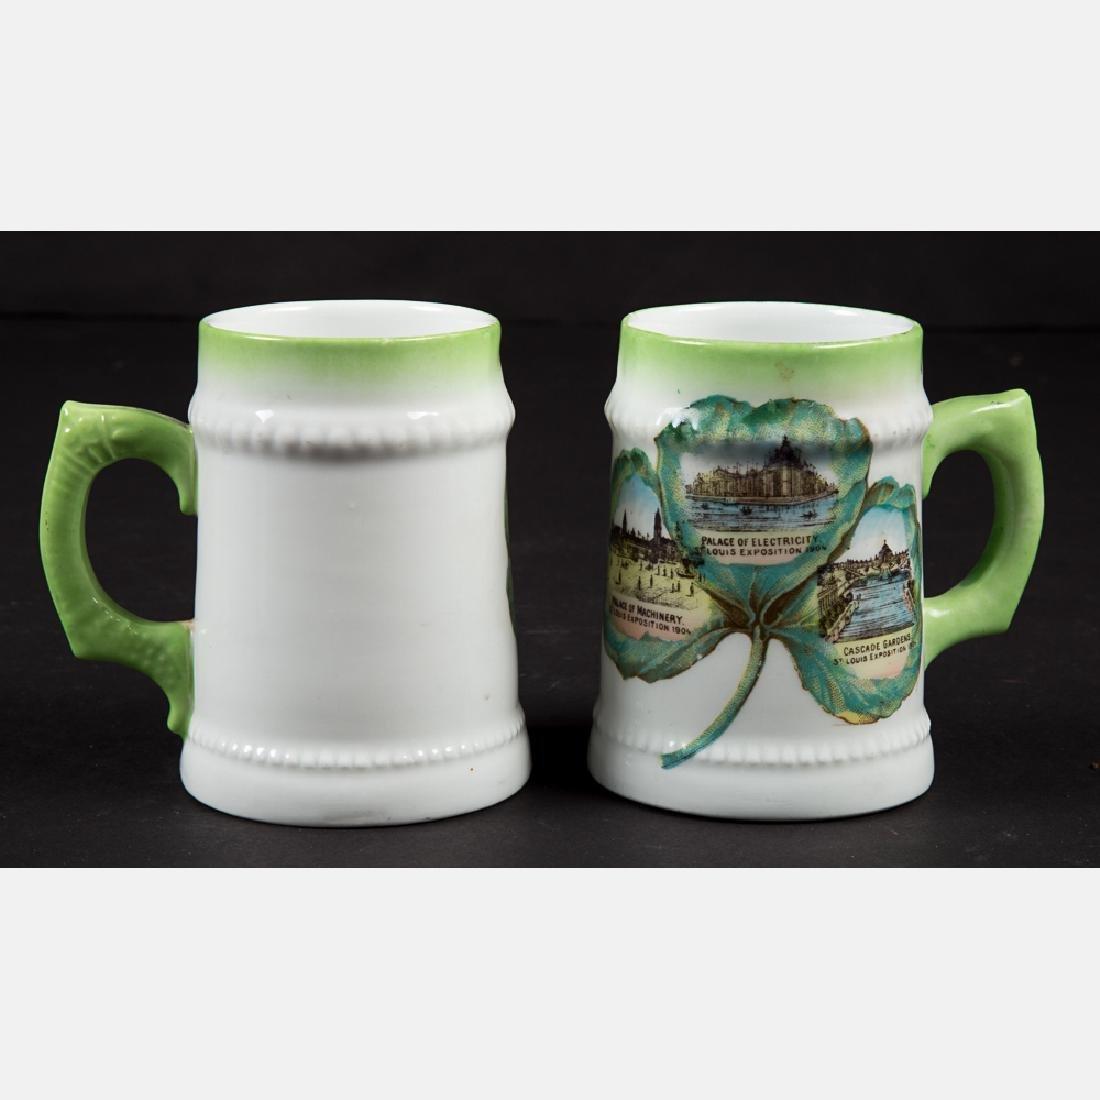 A Miscellaneous Collection of Seven Porcelain - 5